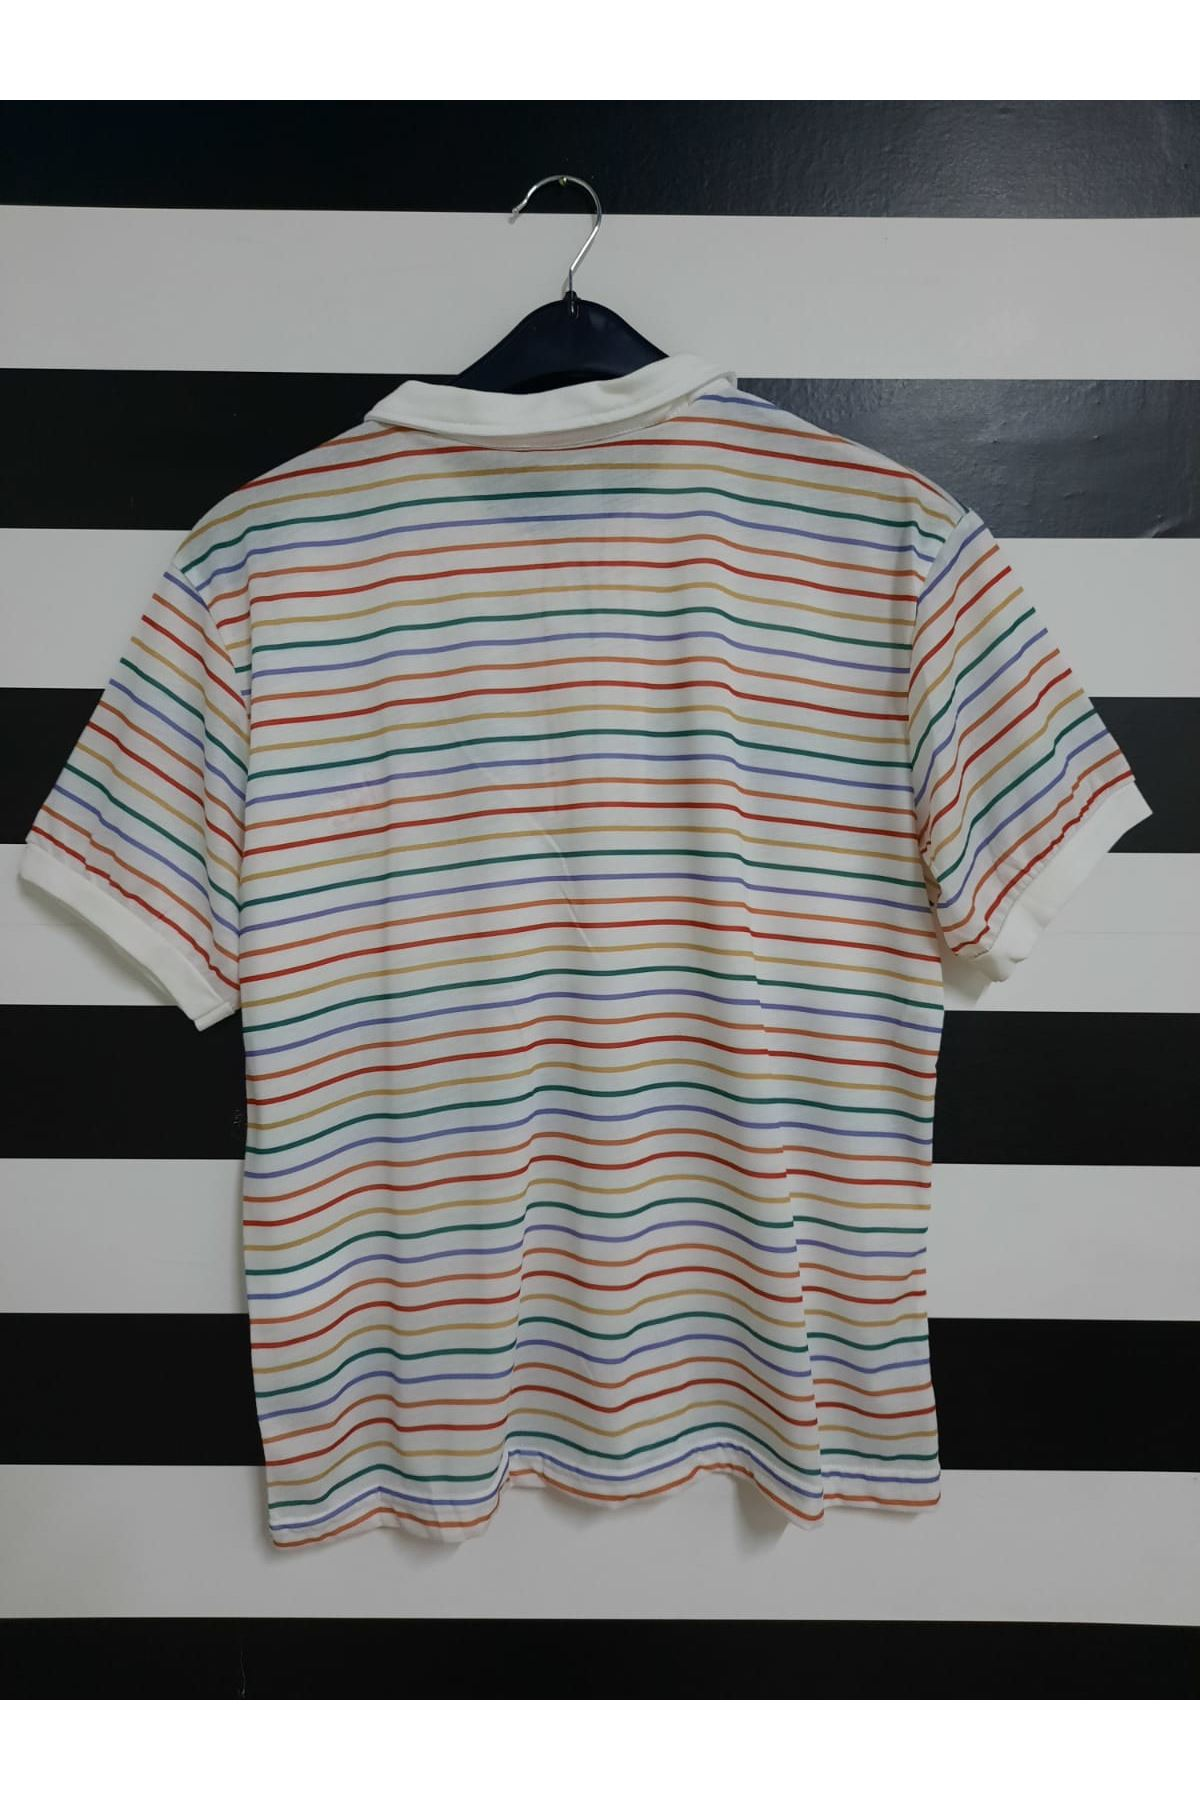 NK Çizgi Desen Tshirt - MULTİ